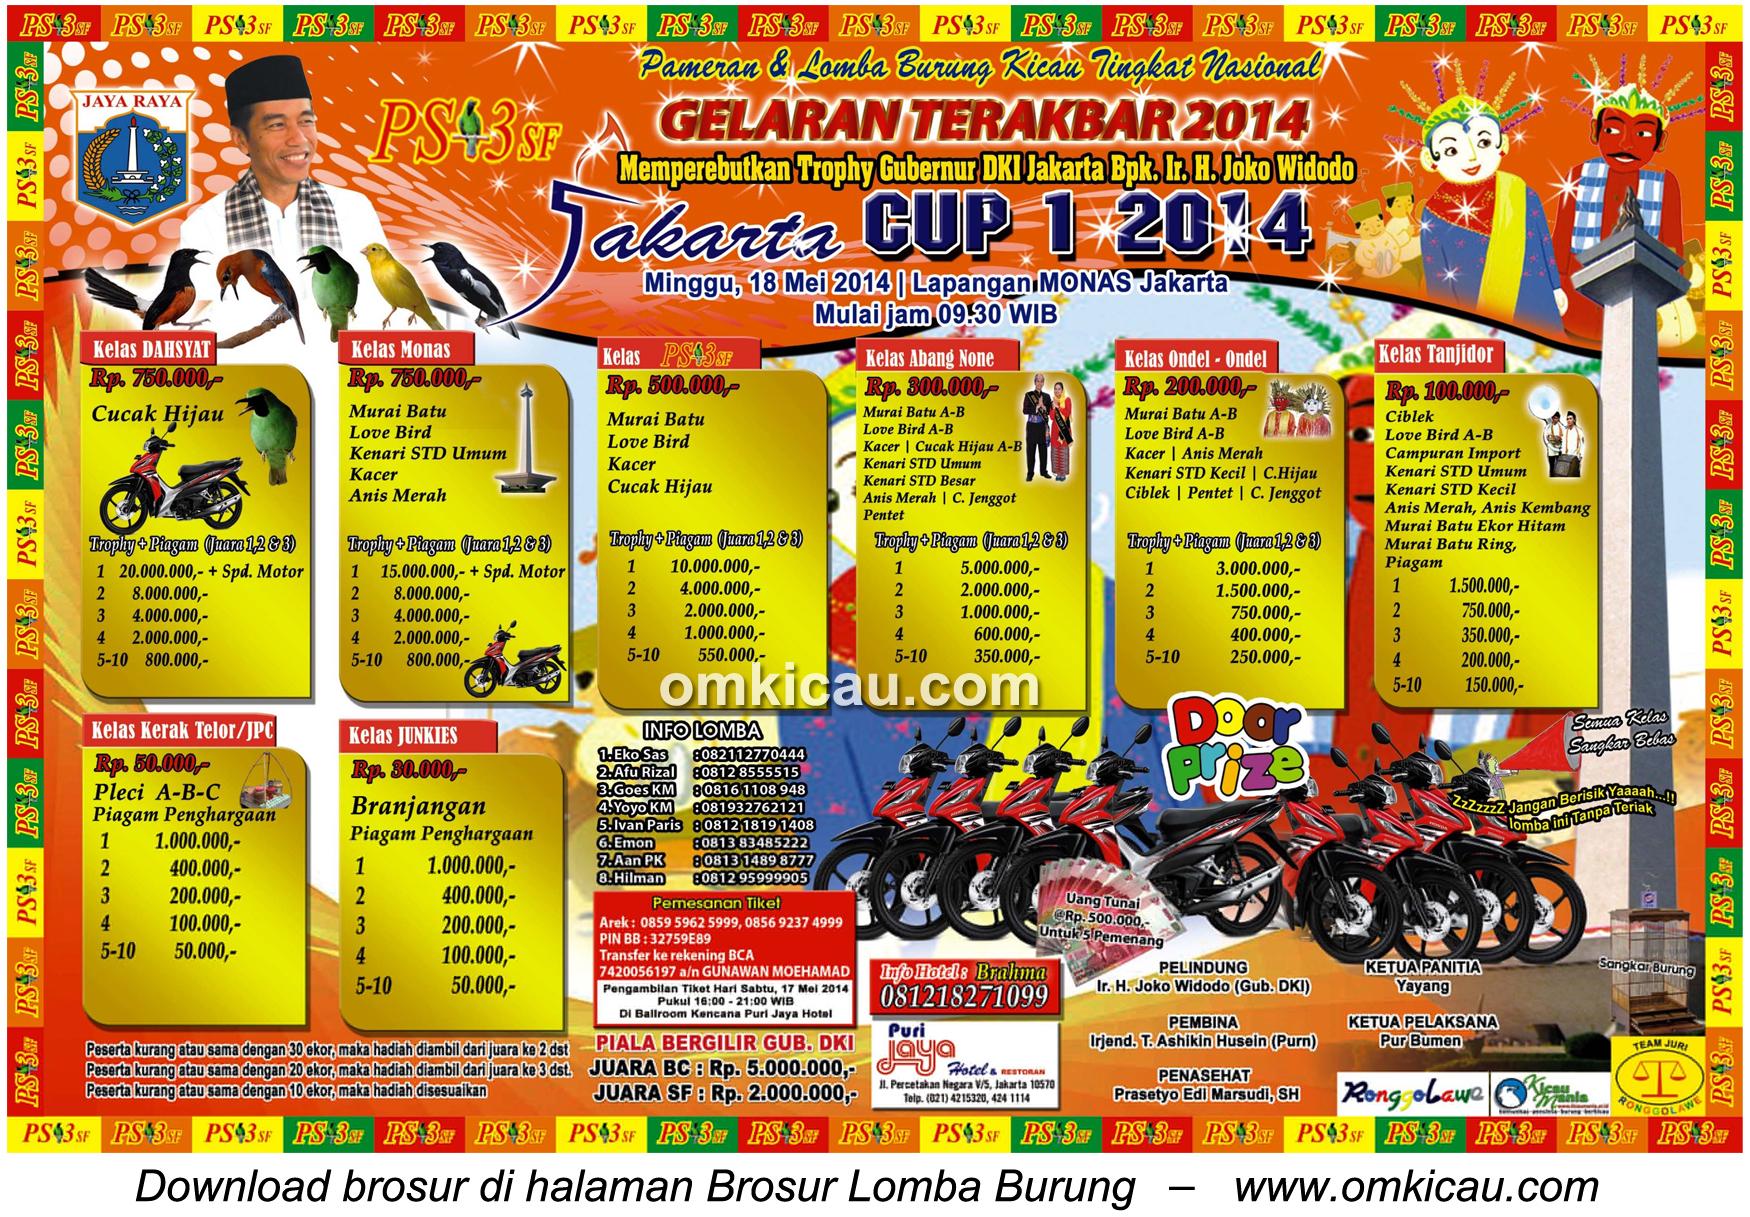 Brosur Lomba Burung Berkicau Jakarta Cup 1 - 18 Mei 2014